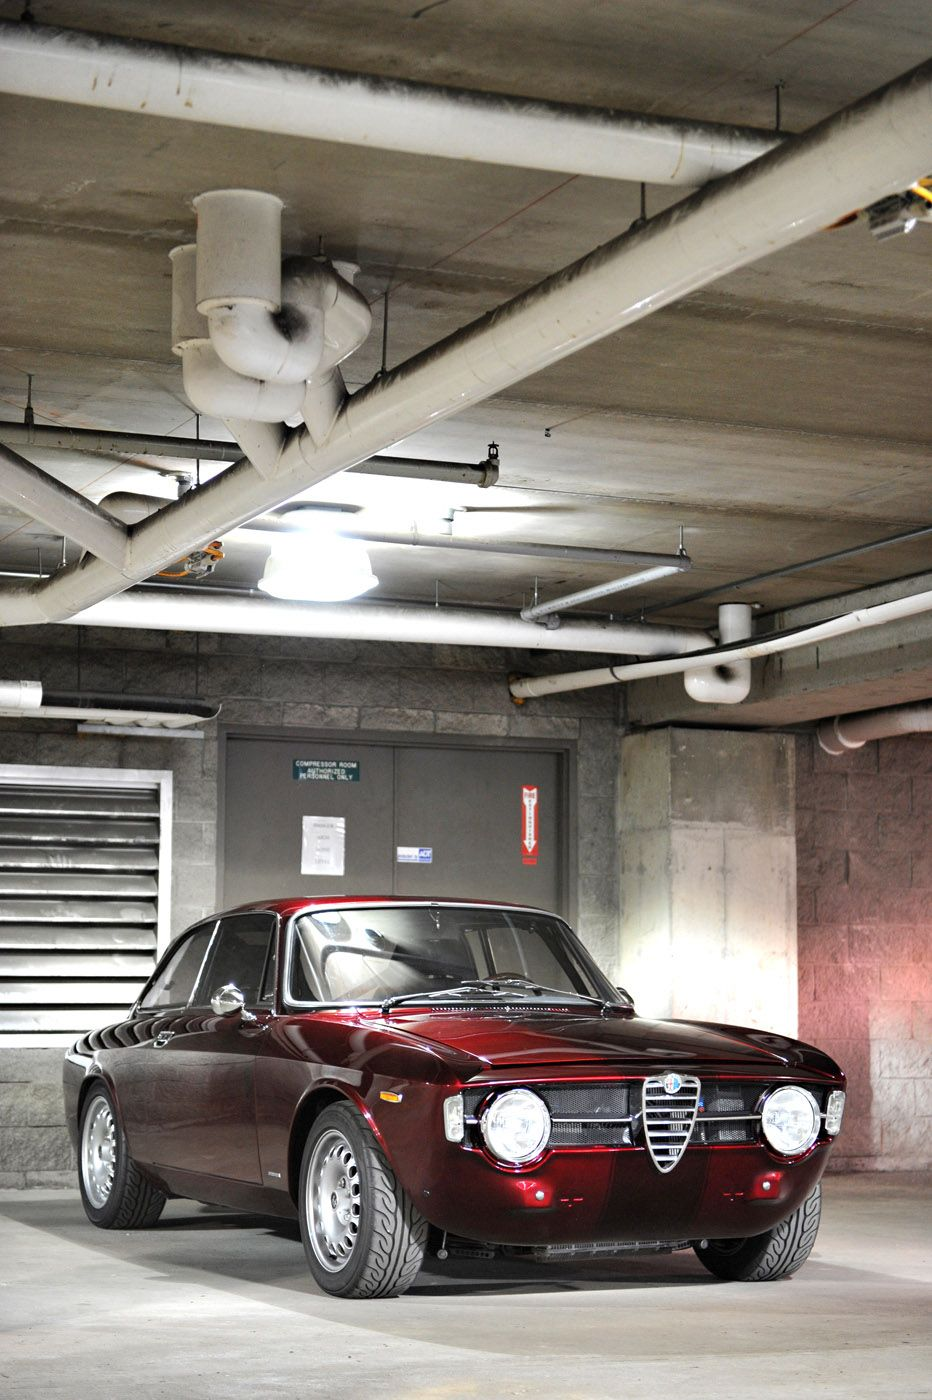 Alfa Gt Anni 70.This Alfa Romeo Gt 1300 Junior Is For Life Classic Cars Alfa Romeo Car Wheels